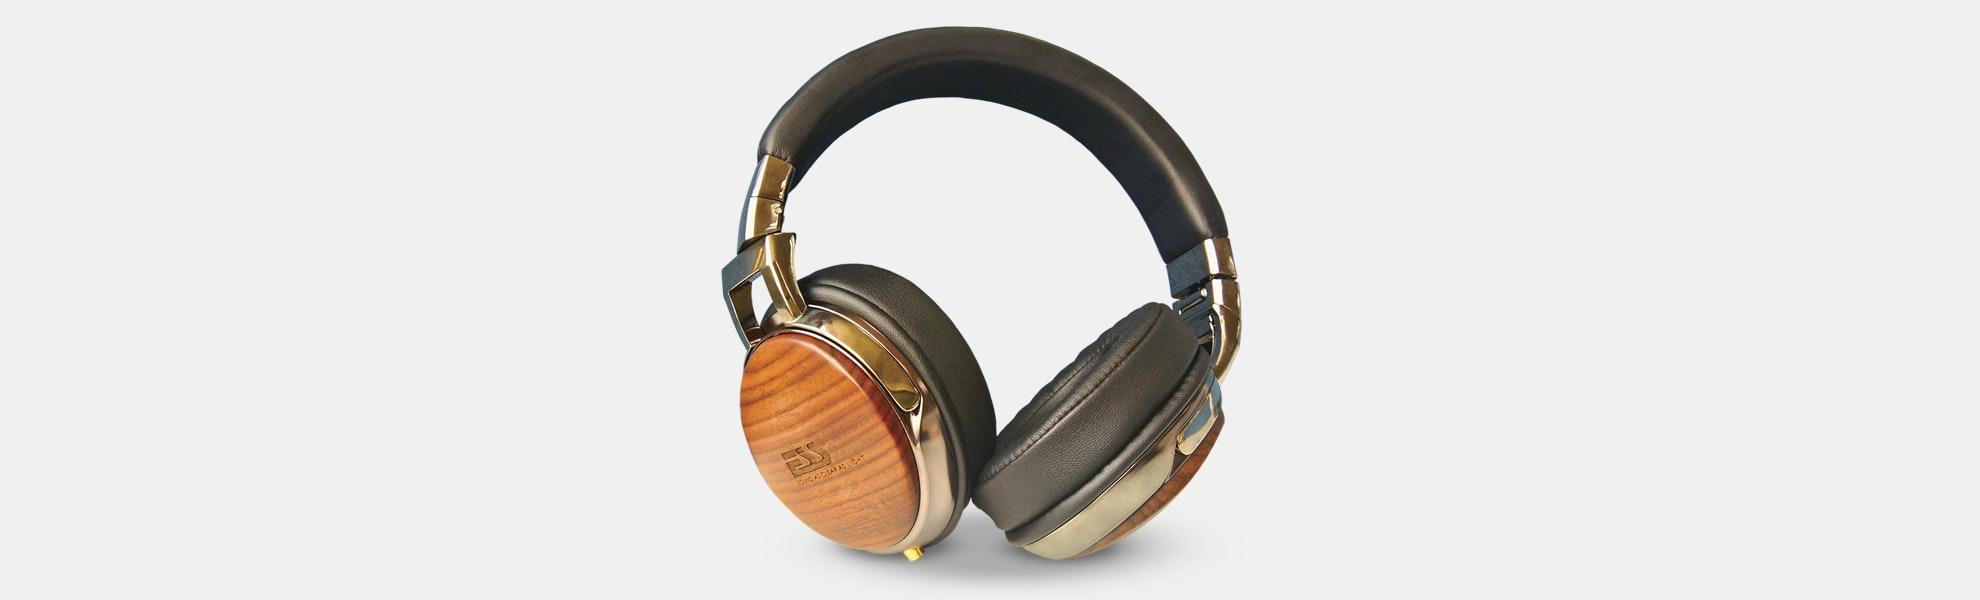 ESS 252 Closed-Back Headphones